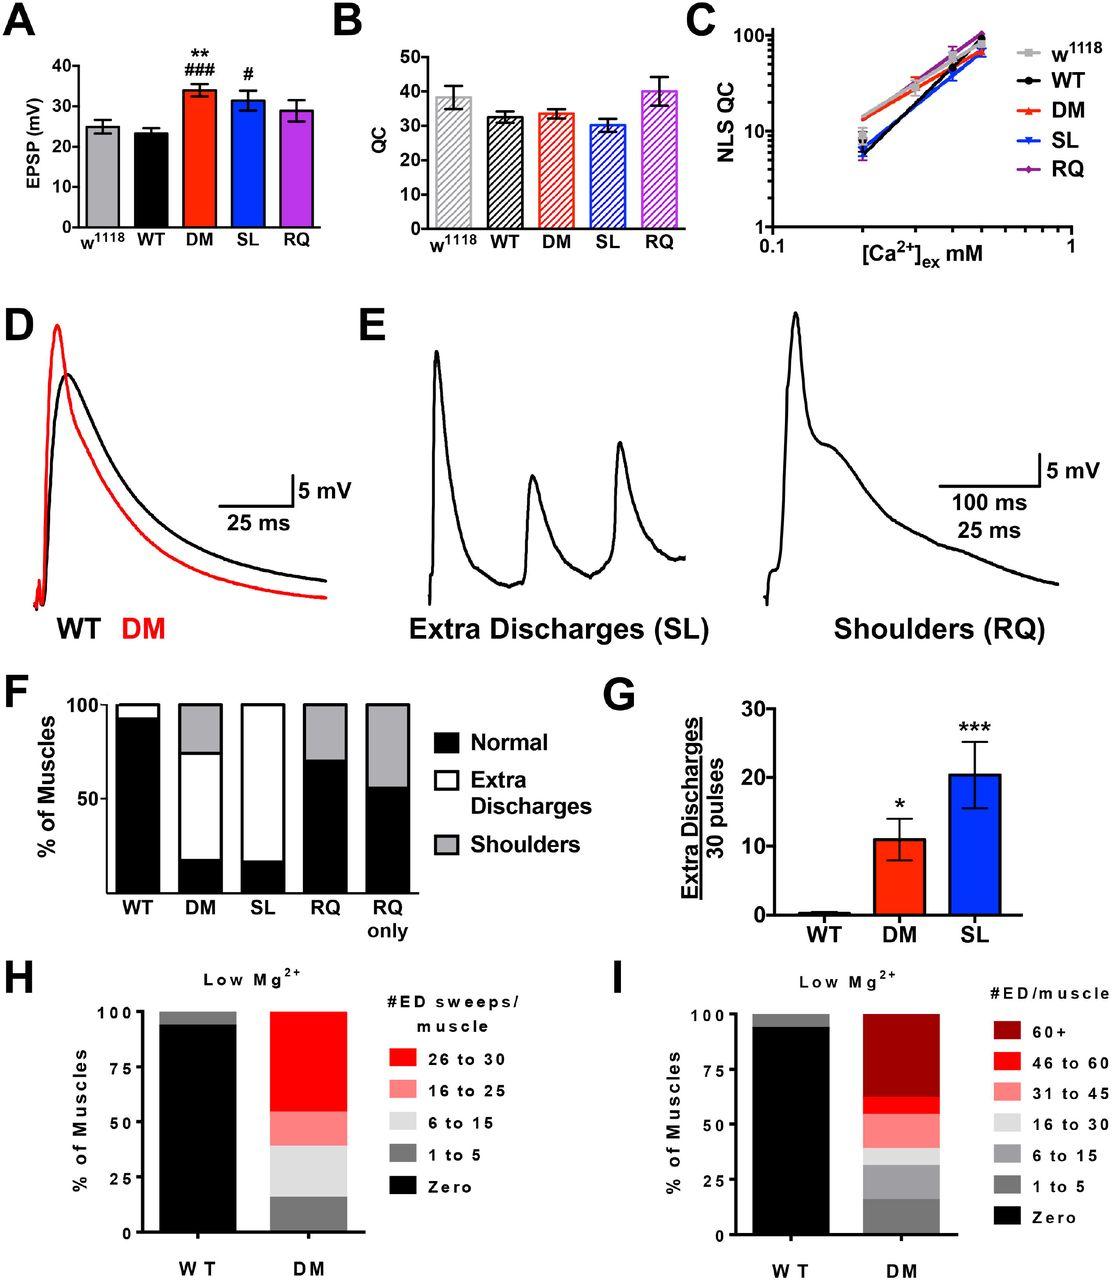 Drosophila Cav2 channels harboring human migraine mutations cause